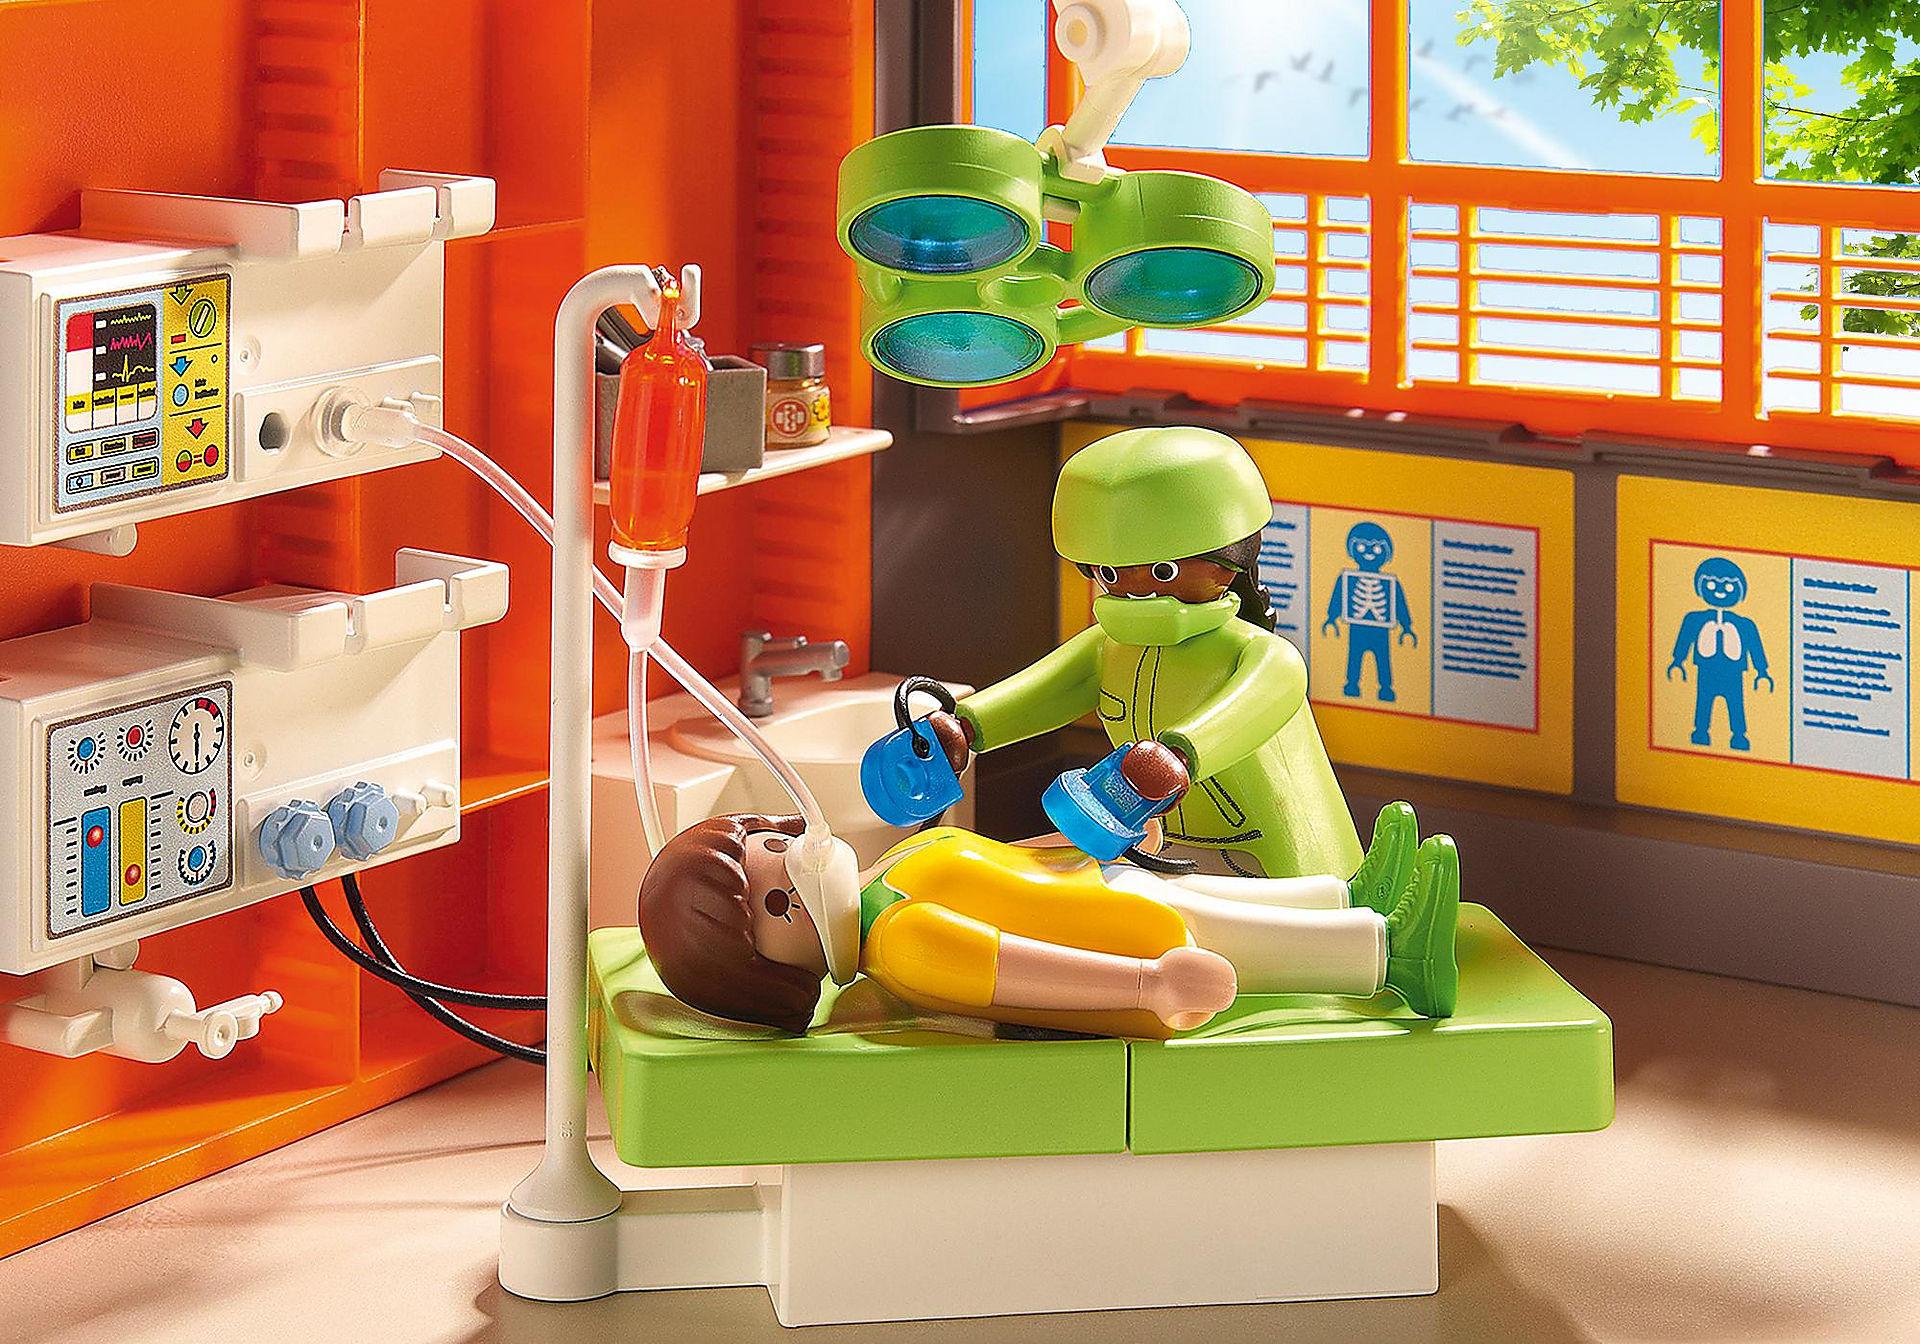 http://media.playmobil.com/i/playmobil/6657_product_extra1/Compleet ingericht kinderziekenhuis